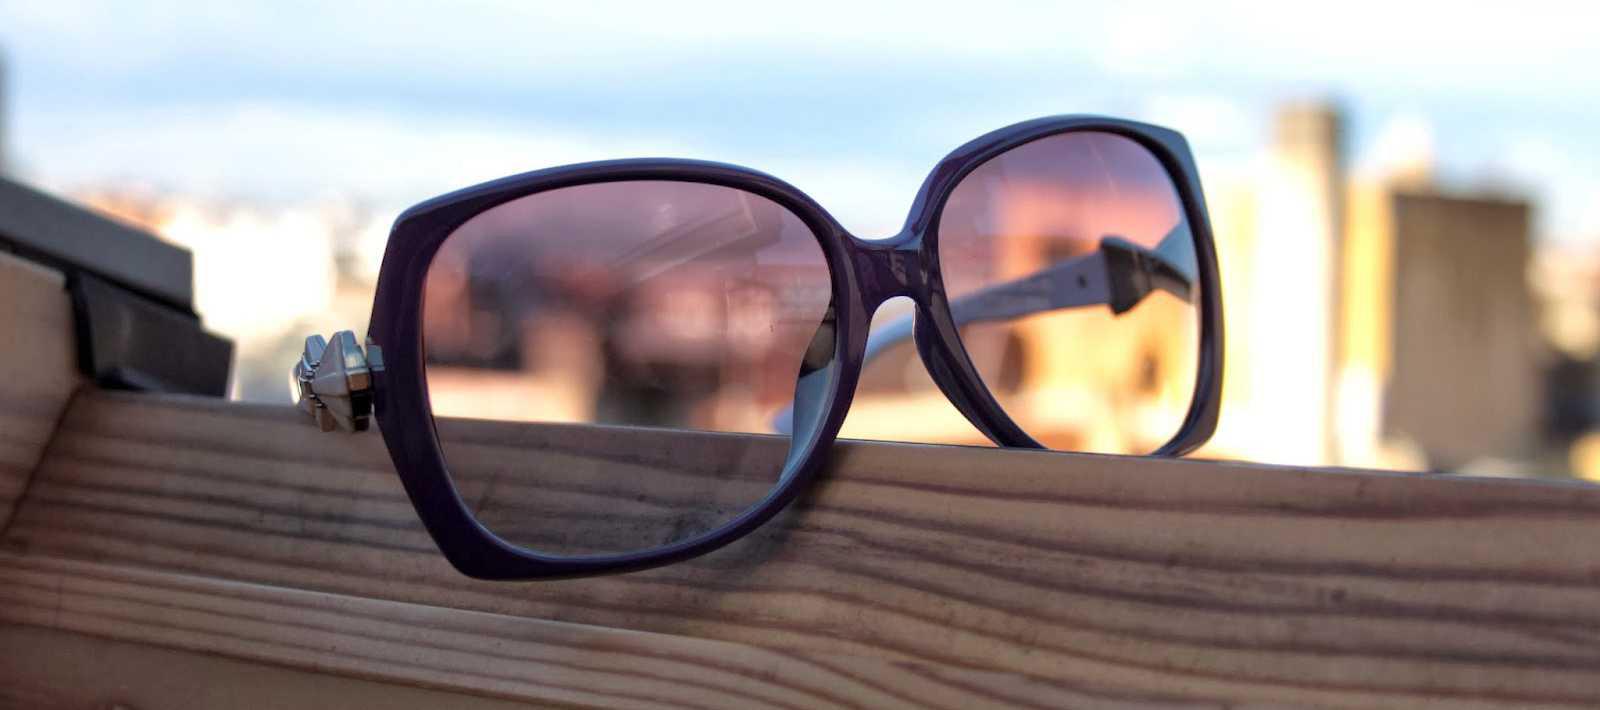 vendita occhiali da sole online